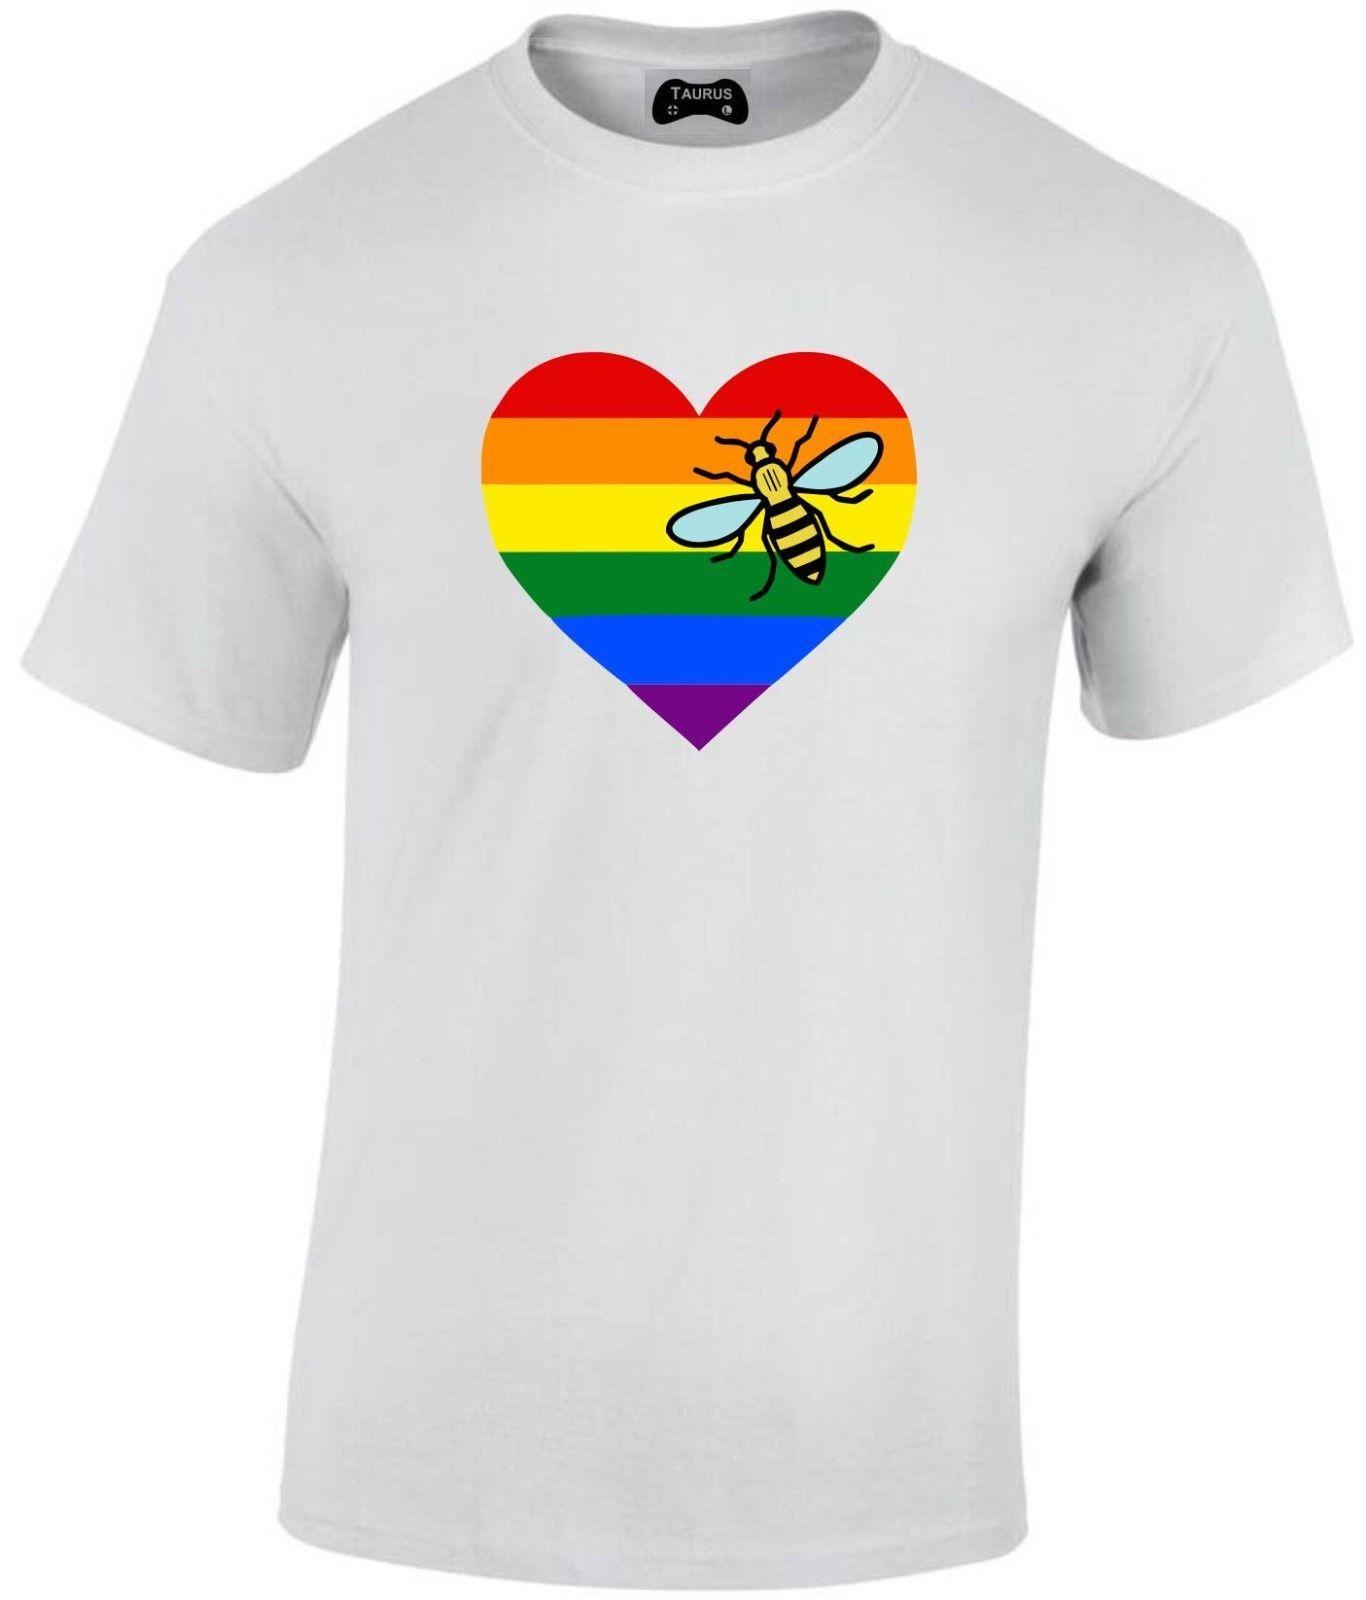 4e6990b40d4e NEW Adult Rainbow Heart MCR Factory Outlet Bee T SHIRT Pride Festival  Factory Outlet Summer Casual Man T Shirt Good Quality T Shirt T Tee Shirts  Online ...